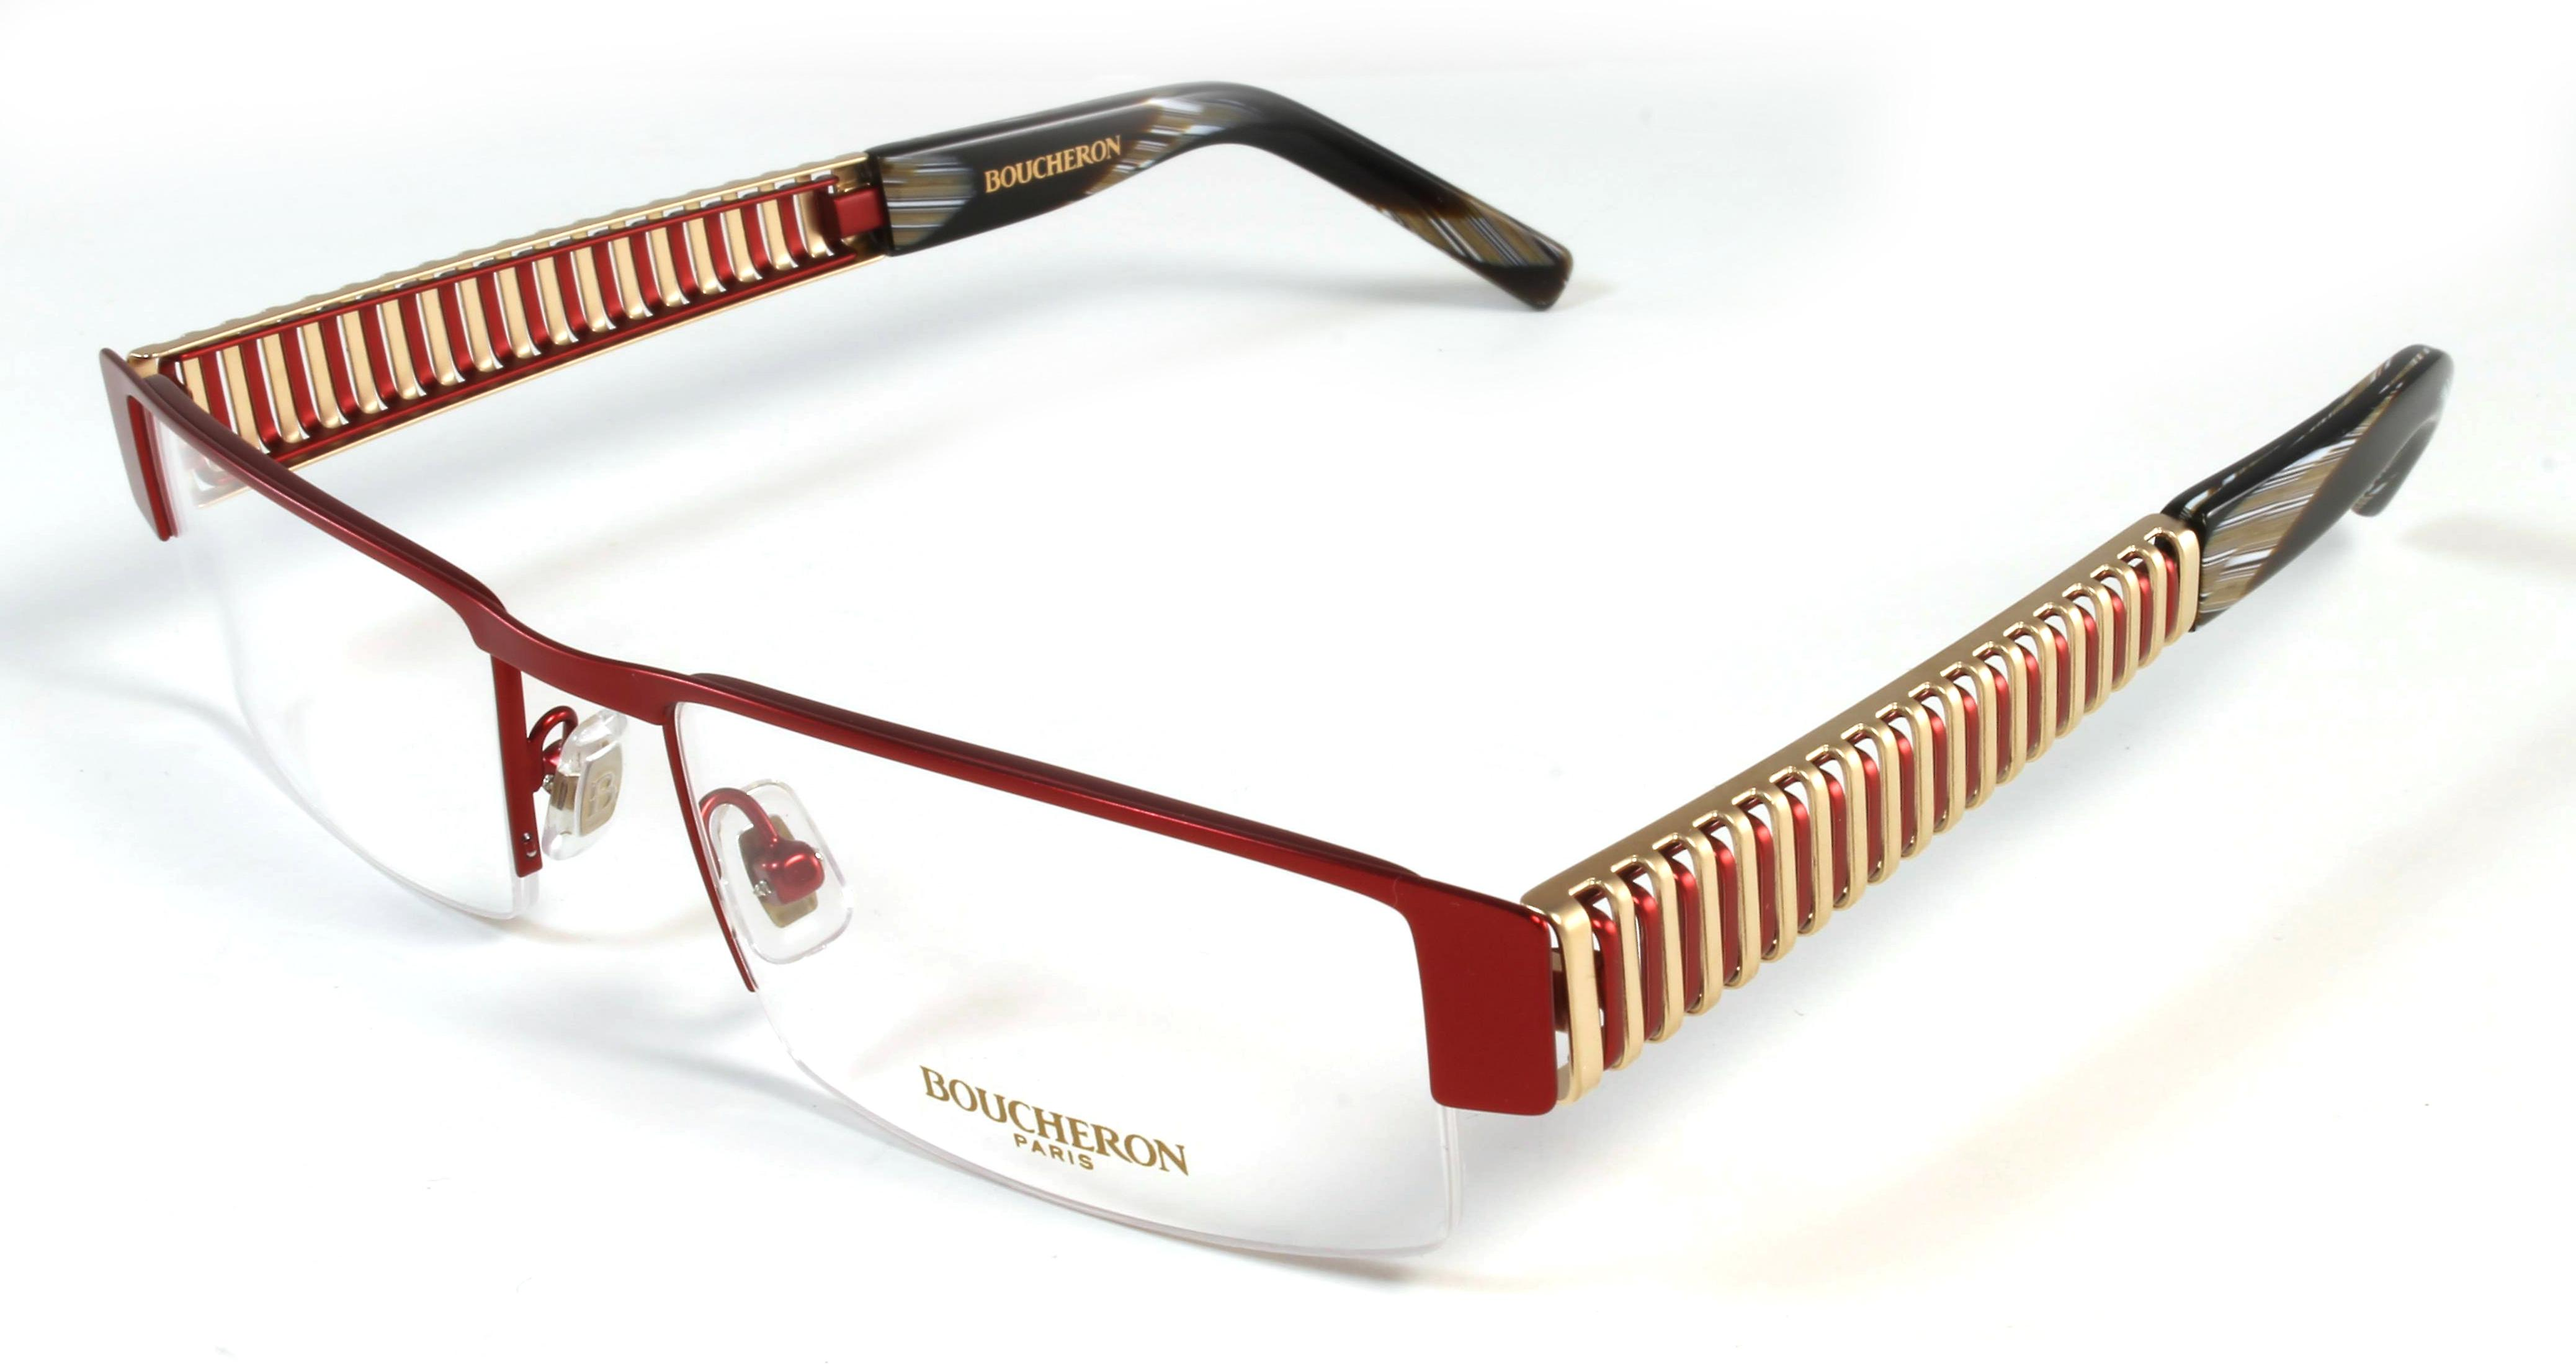 Boucheron Unisex Slim Rectangular Eyeglasses Red/Gold